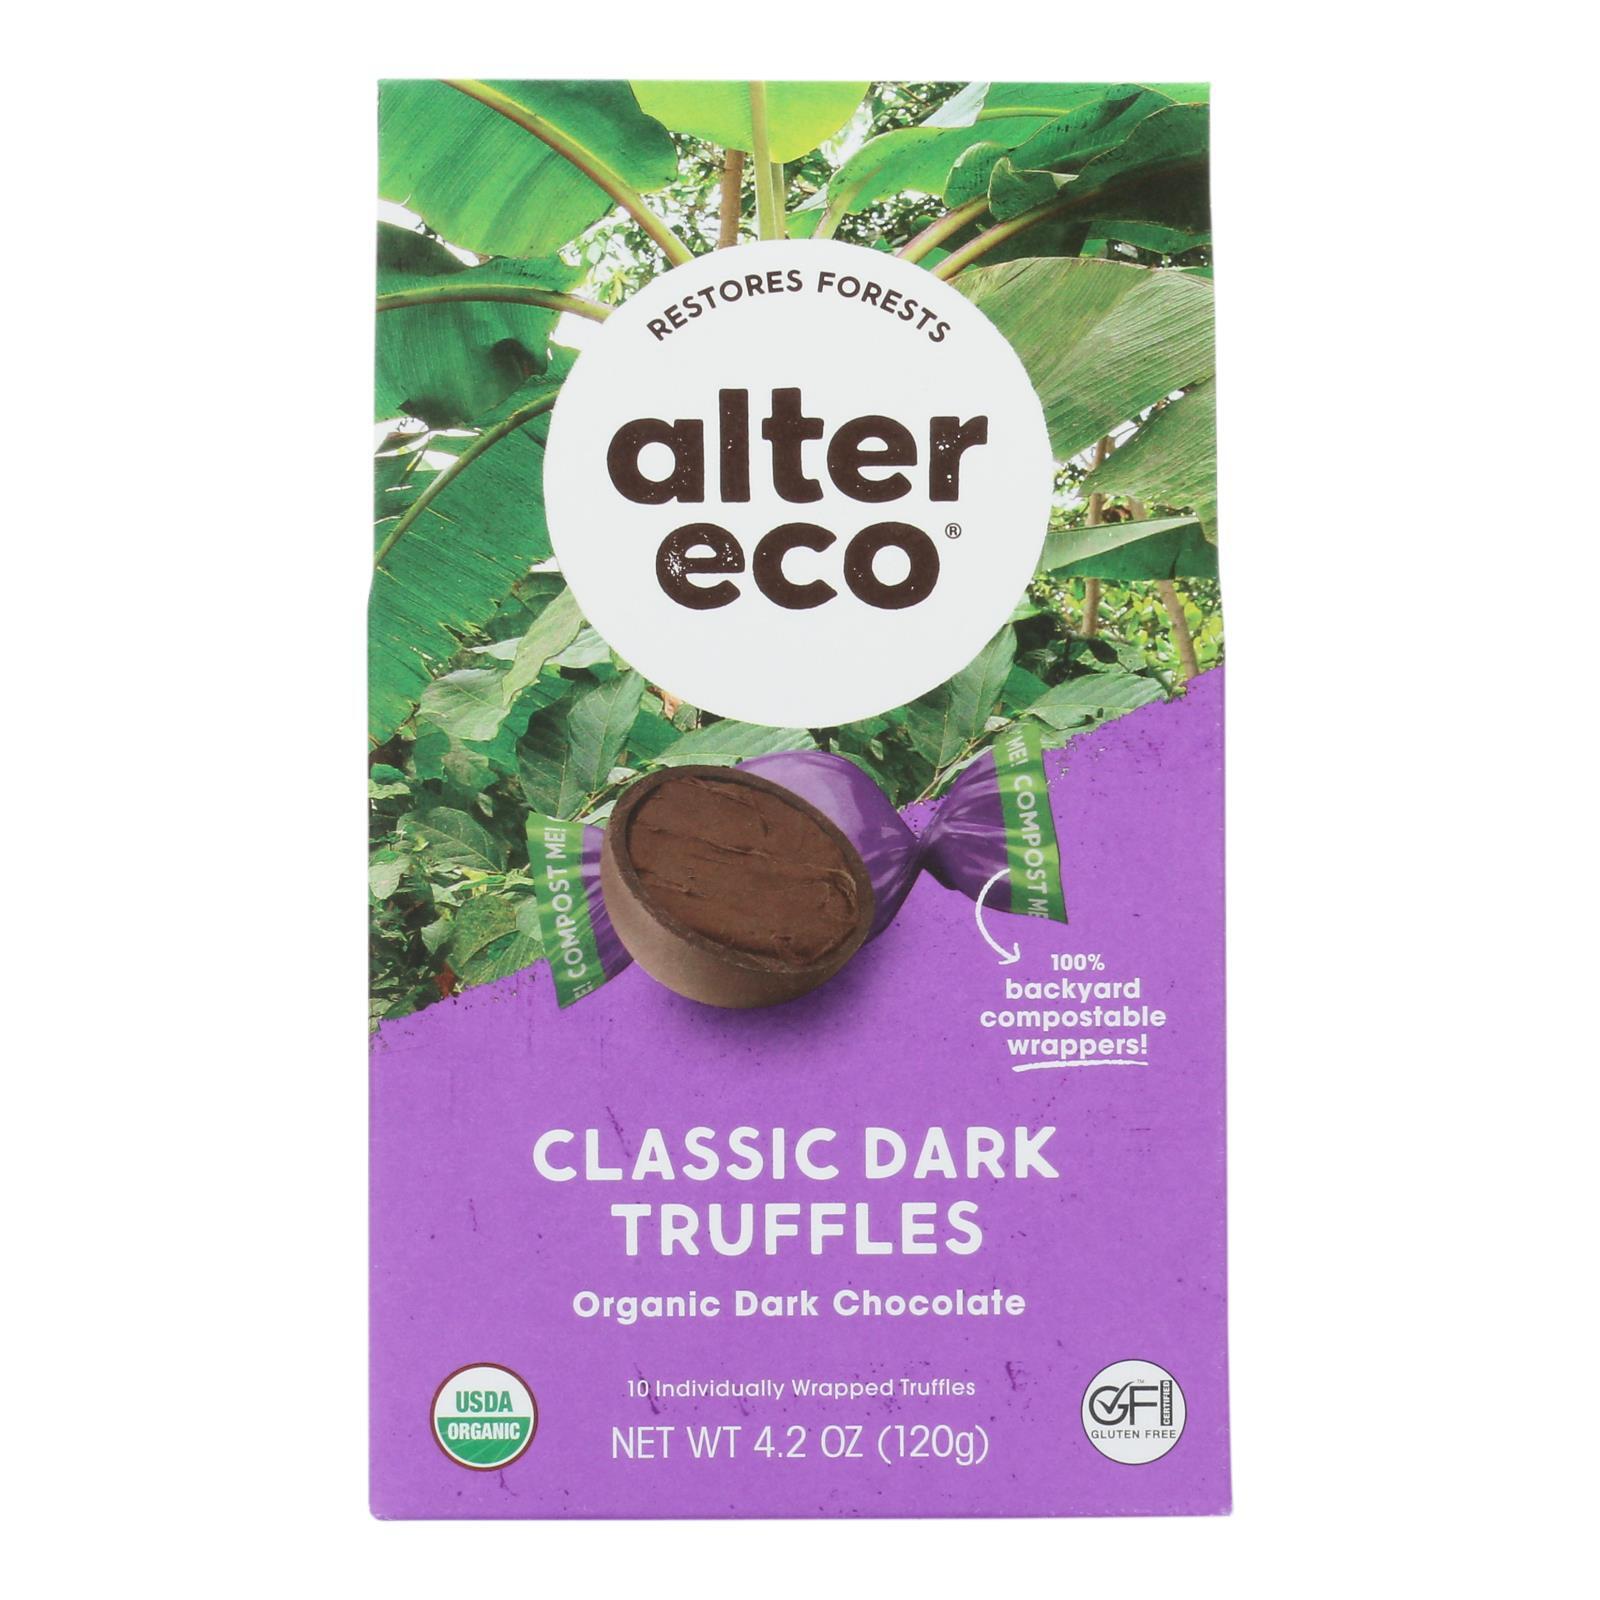 Alter Eco Americas Truffle - Organic - Black - 10 pack - 4.2 oz - case of 8